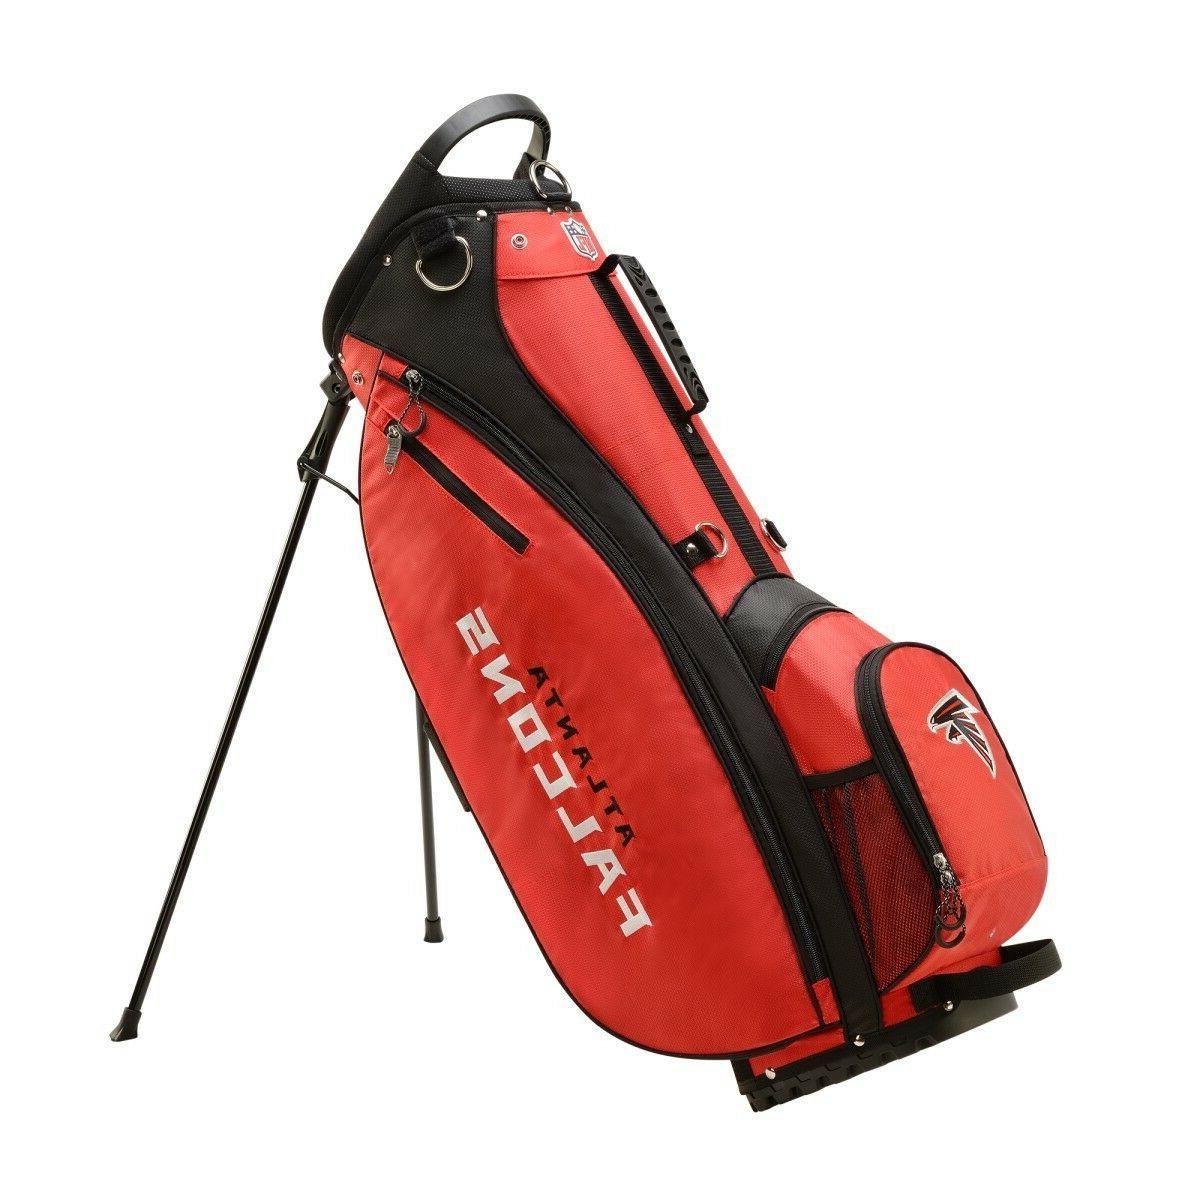 new nfl carry golf bag atlanta falcons